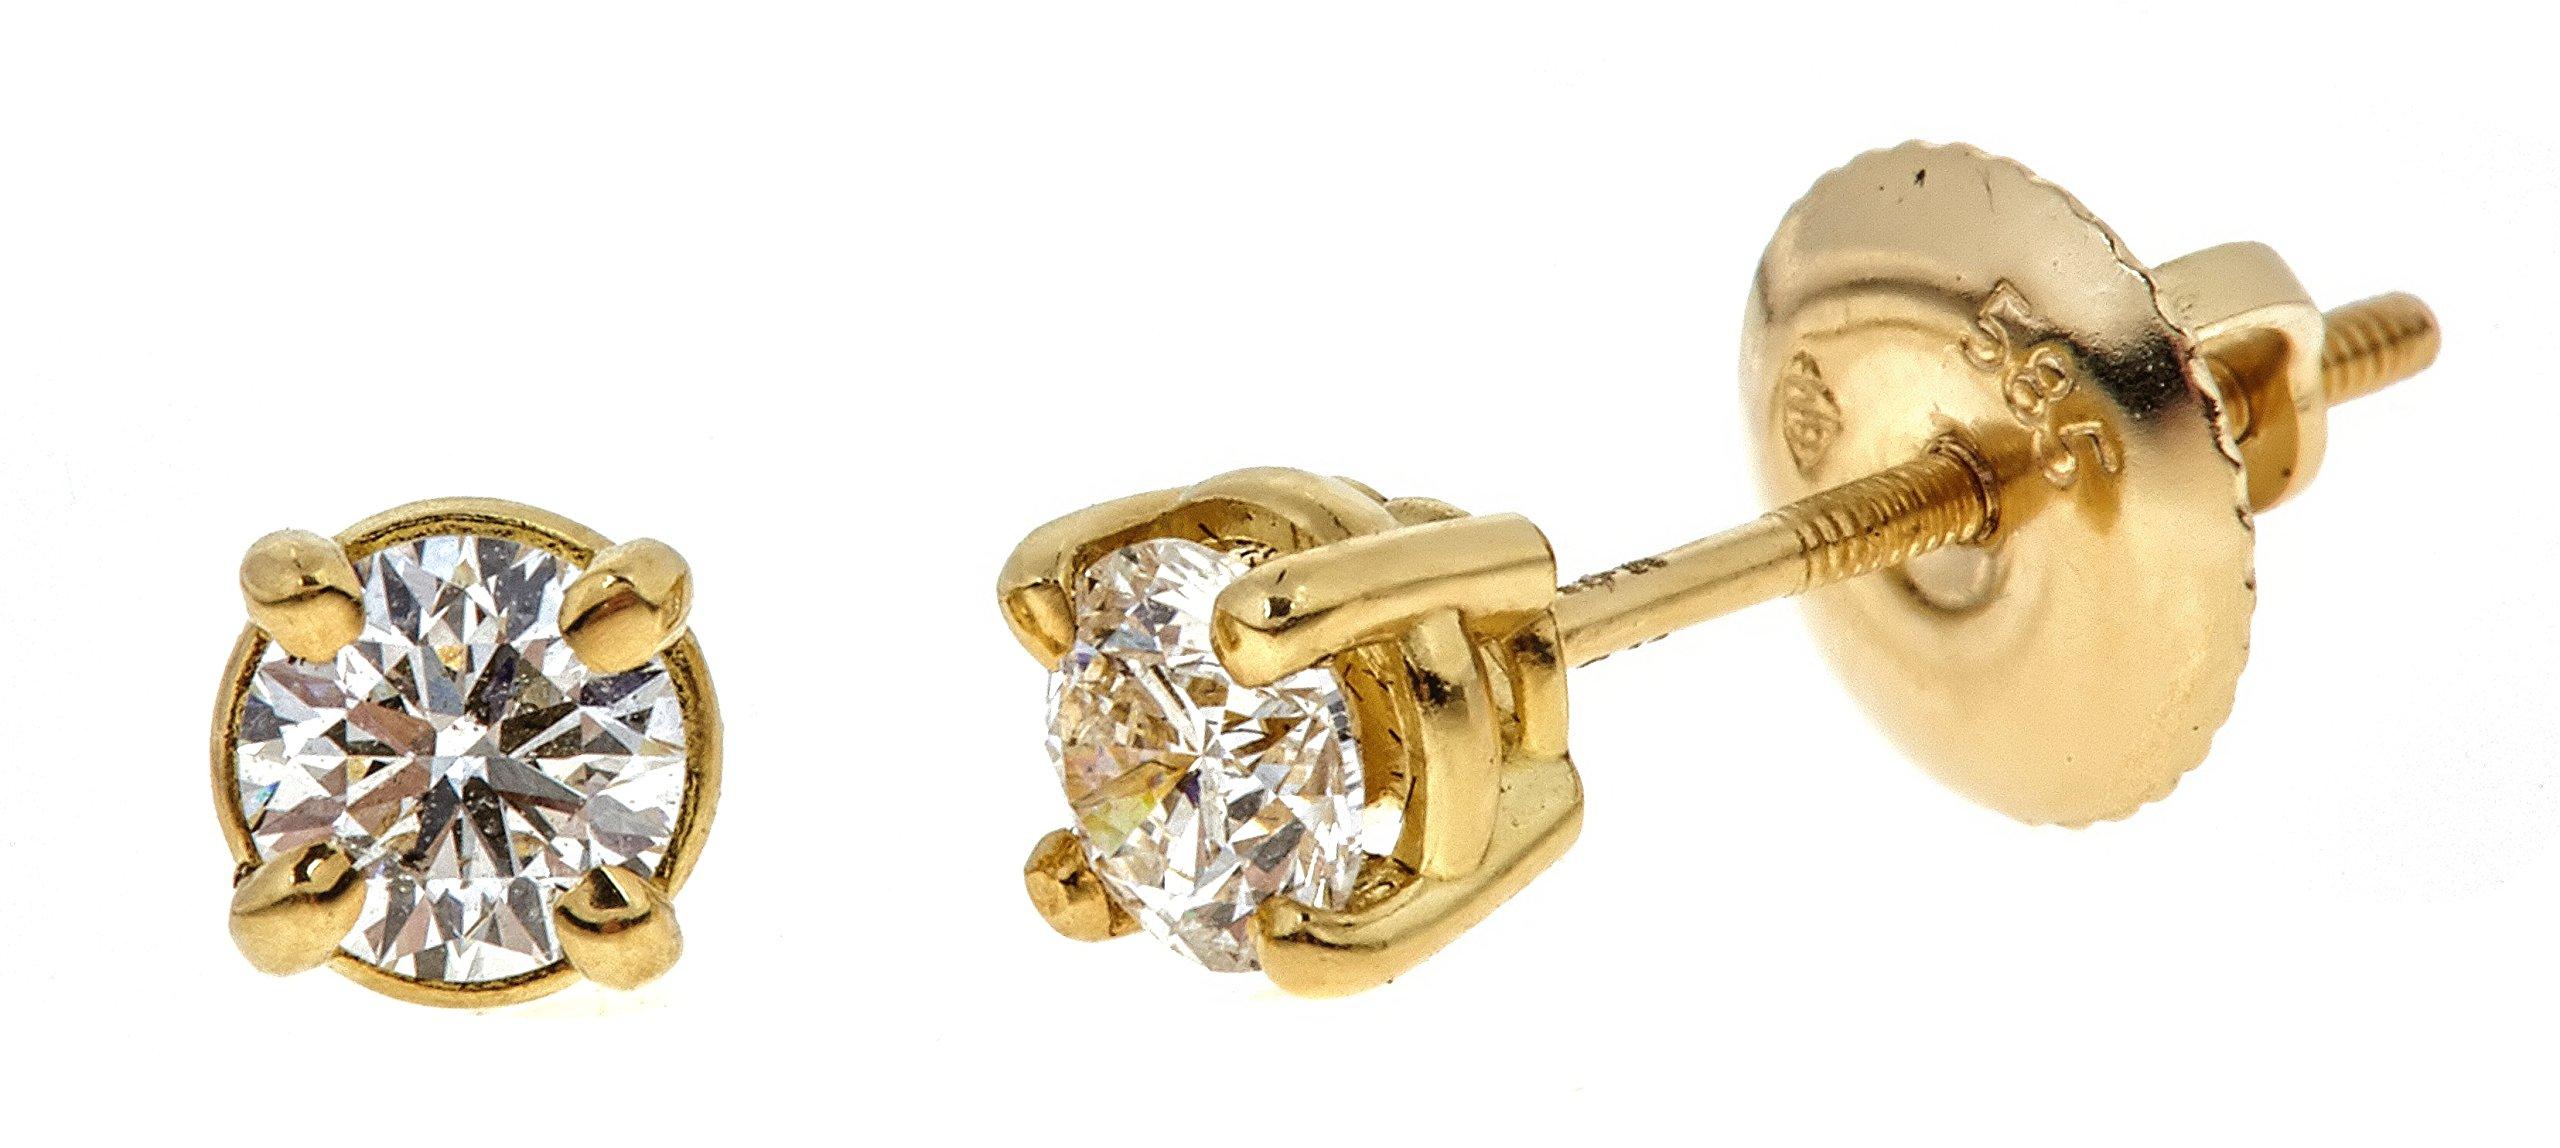 14k Yellow Gold Diamond Round-Cut Stud Earrings (1/4cttw, J-K Color, I2-I3 Clarity)